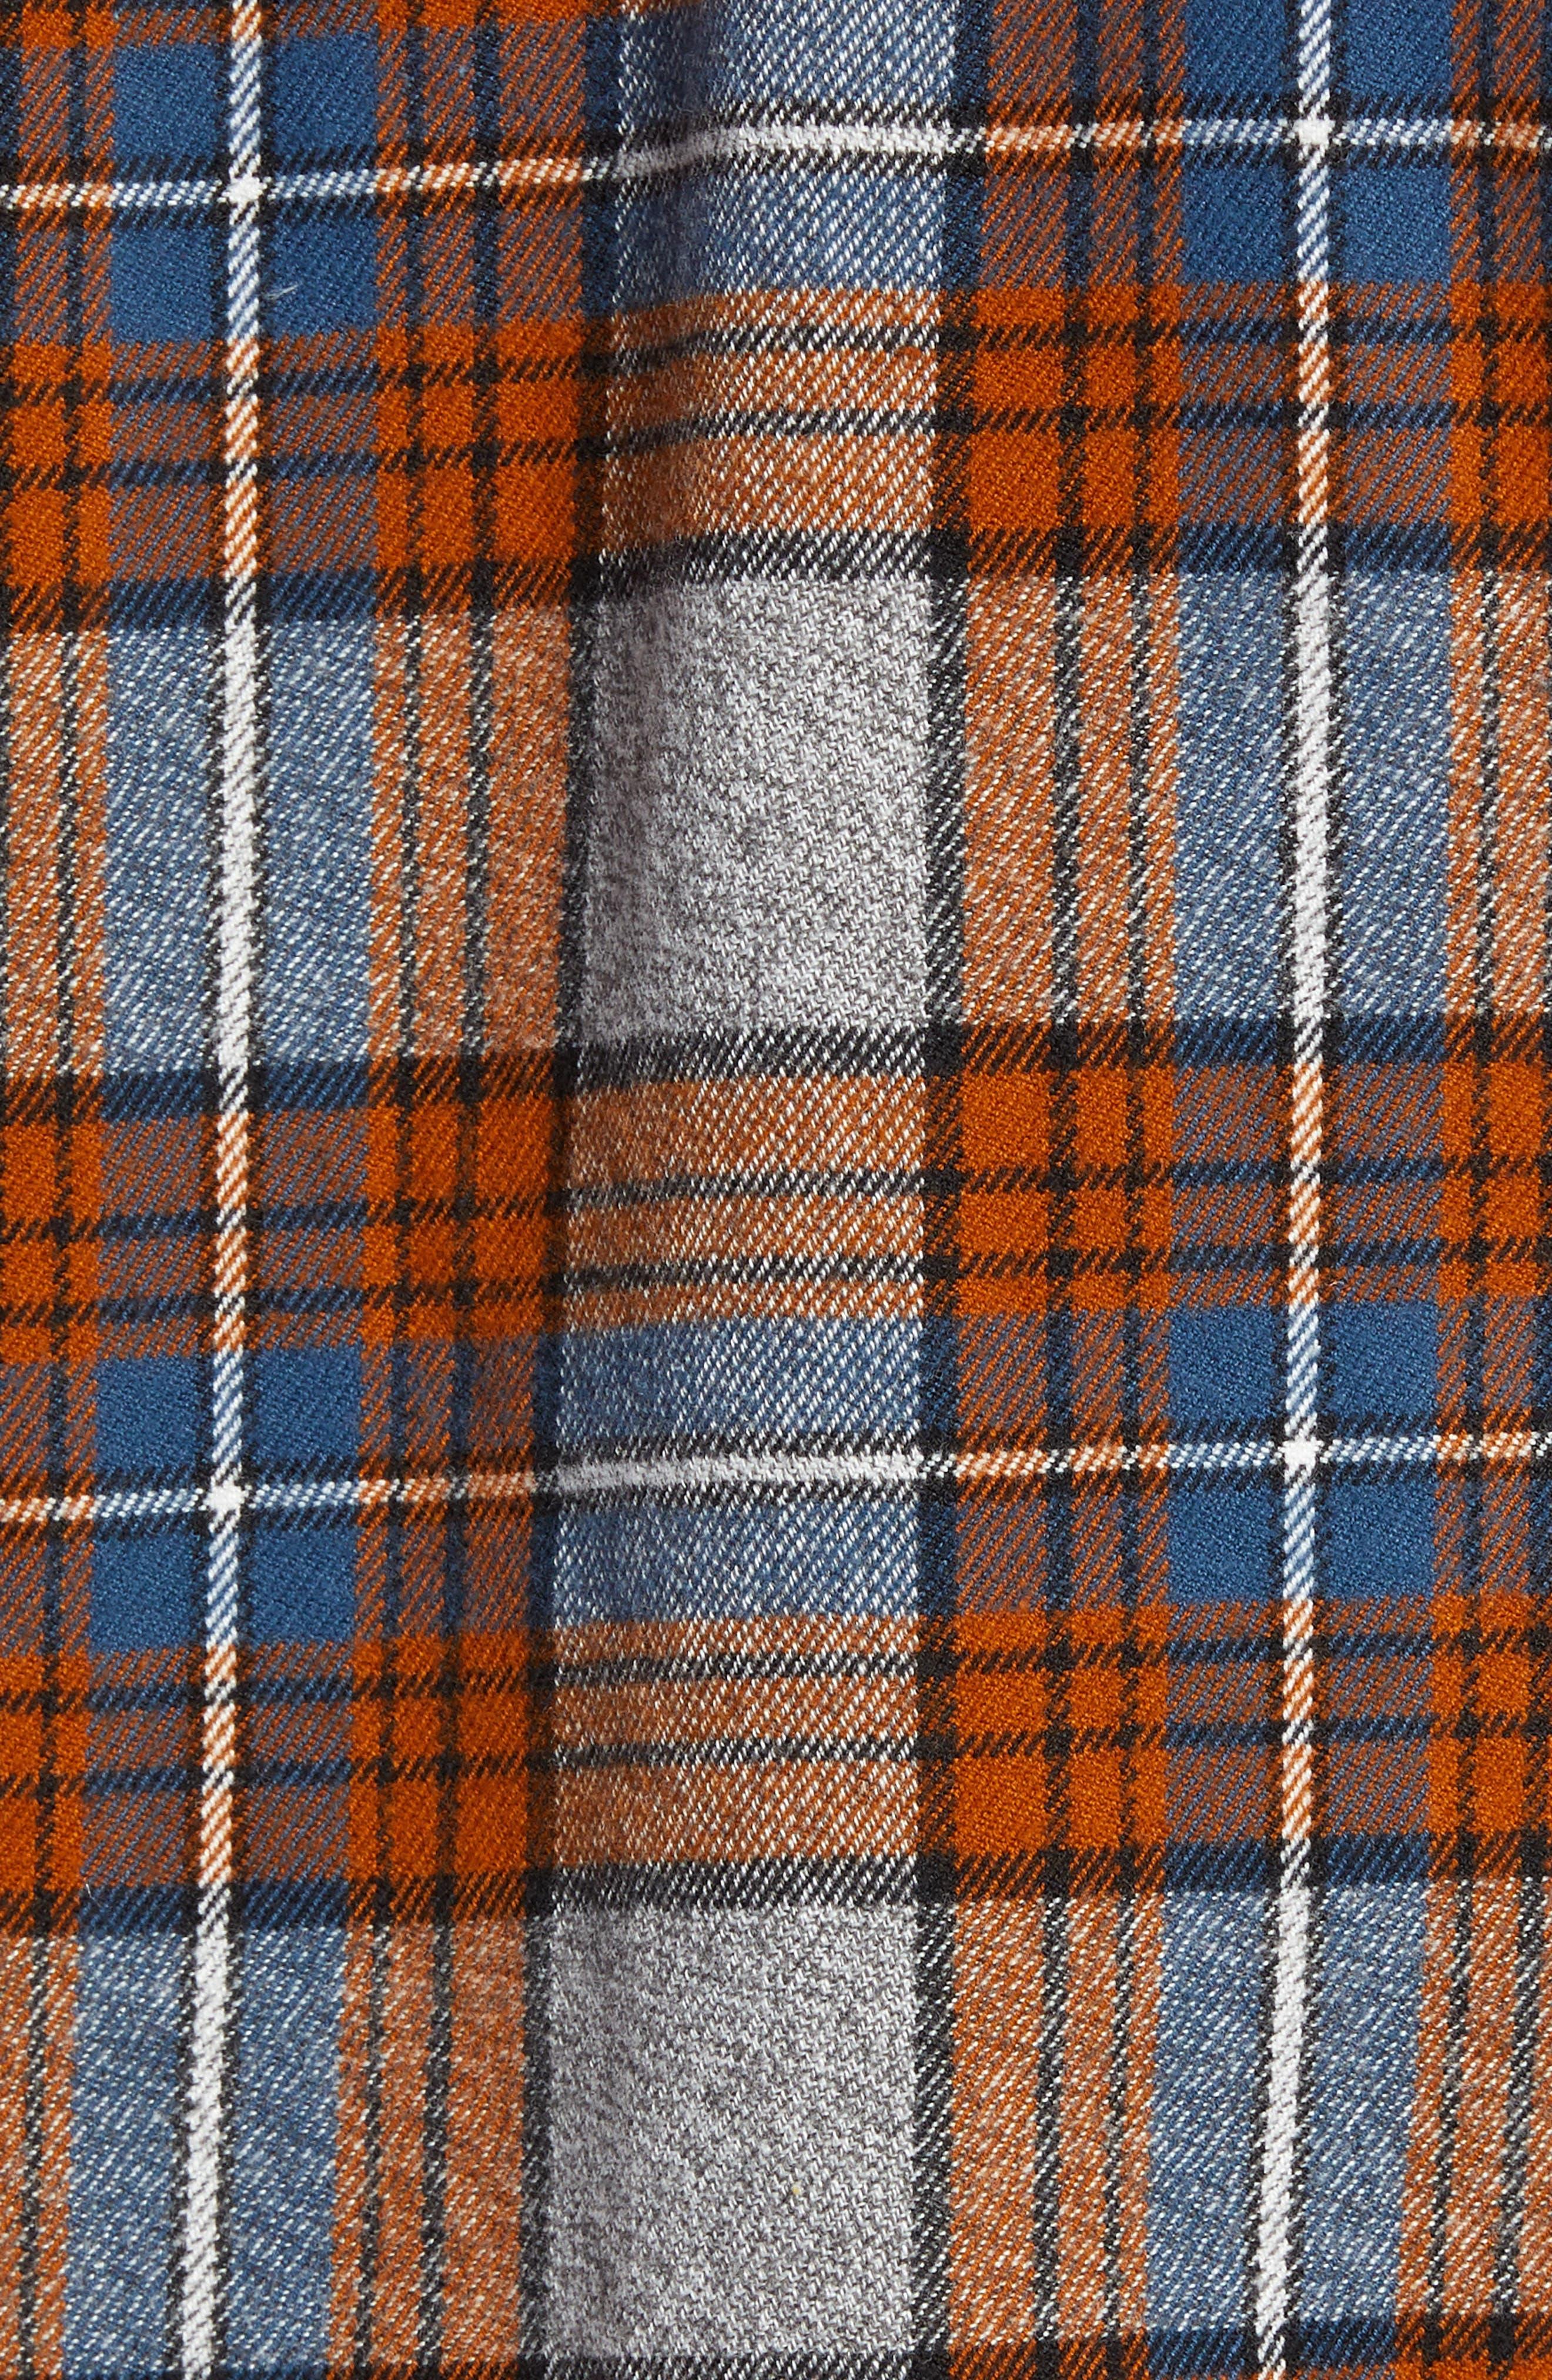 Regular Fit Workwear Plaid Flannel Shirt,                             Alternate thumbnail 5, color,                             RUST AUTUMN BLUE PLAID